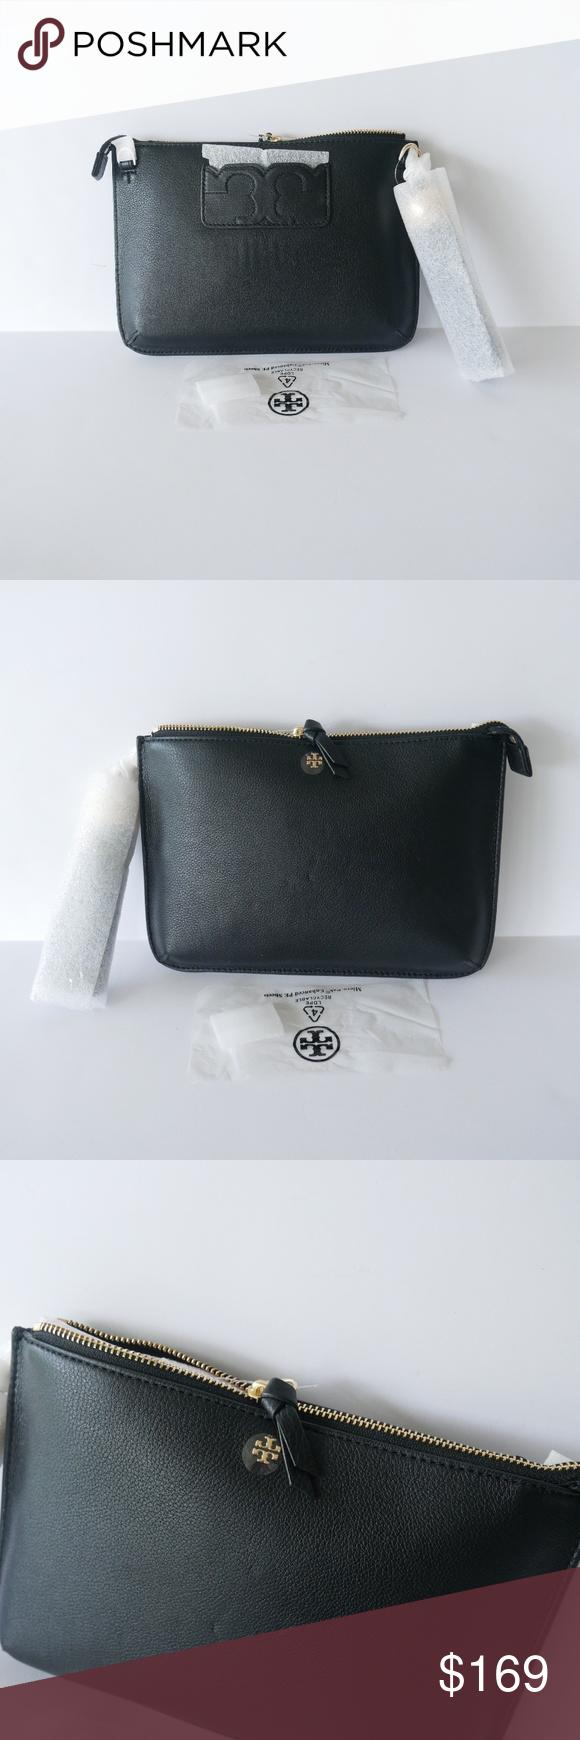 Tory Burch Tassel Crossbody Clutch Pb Leather Bag New With Tags NEW Tory  Burch Pebbled Leather a494e292ca